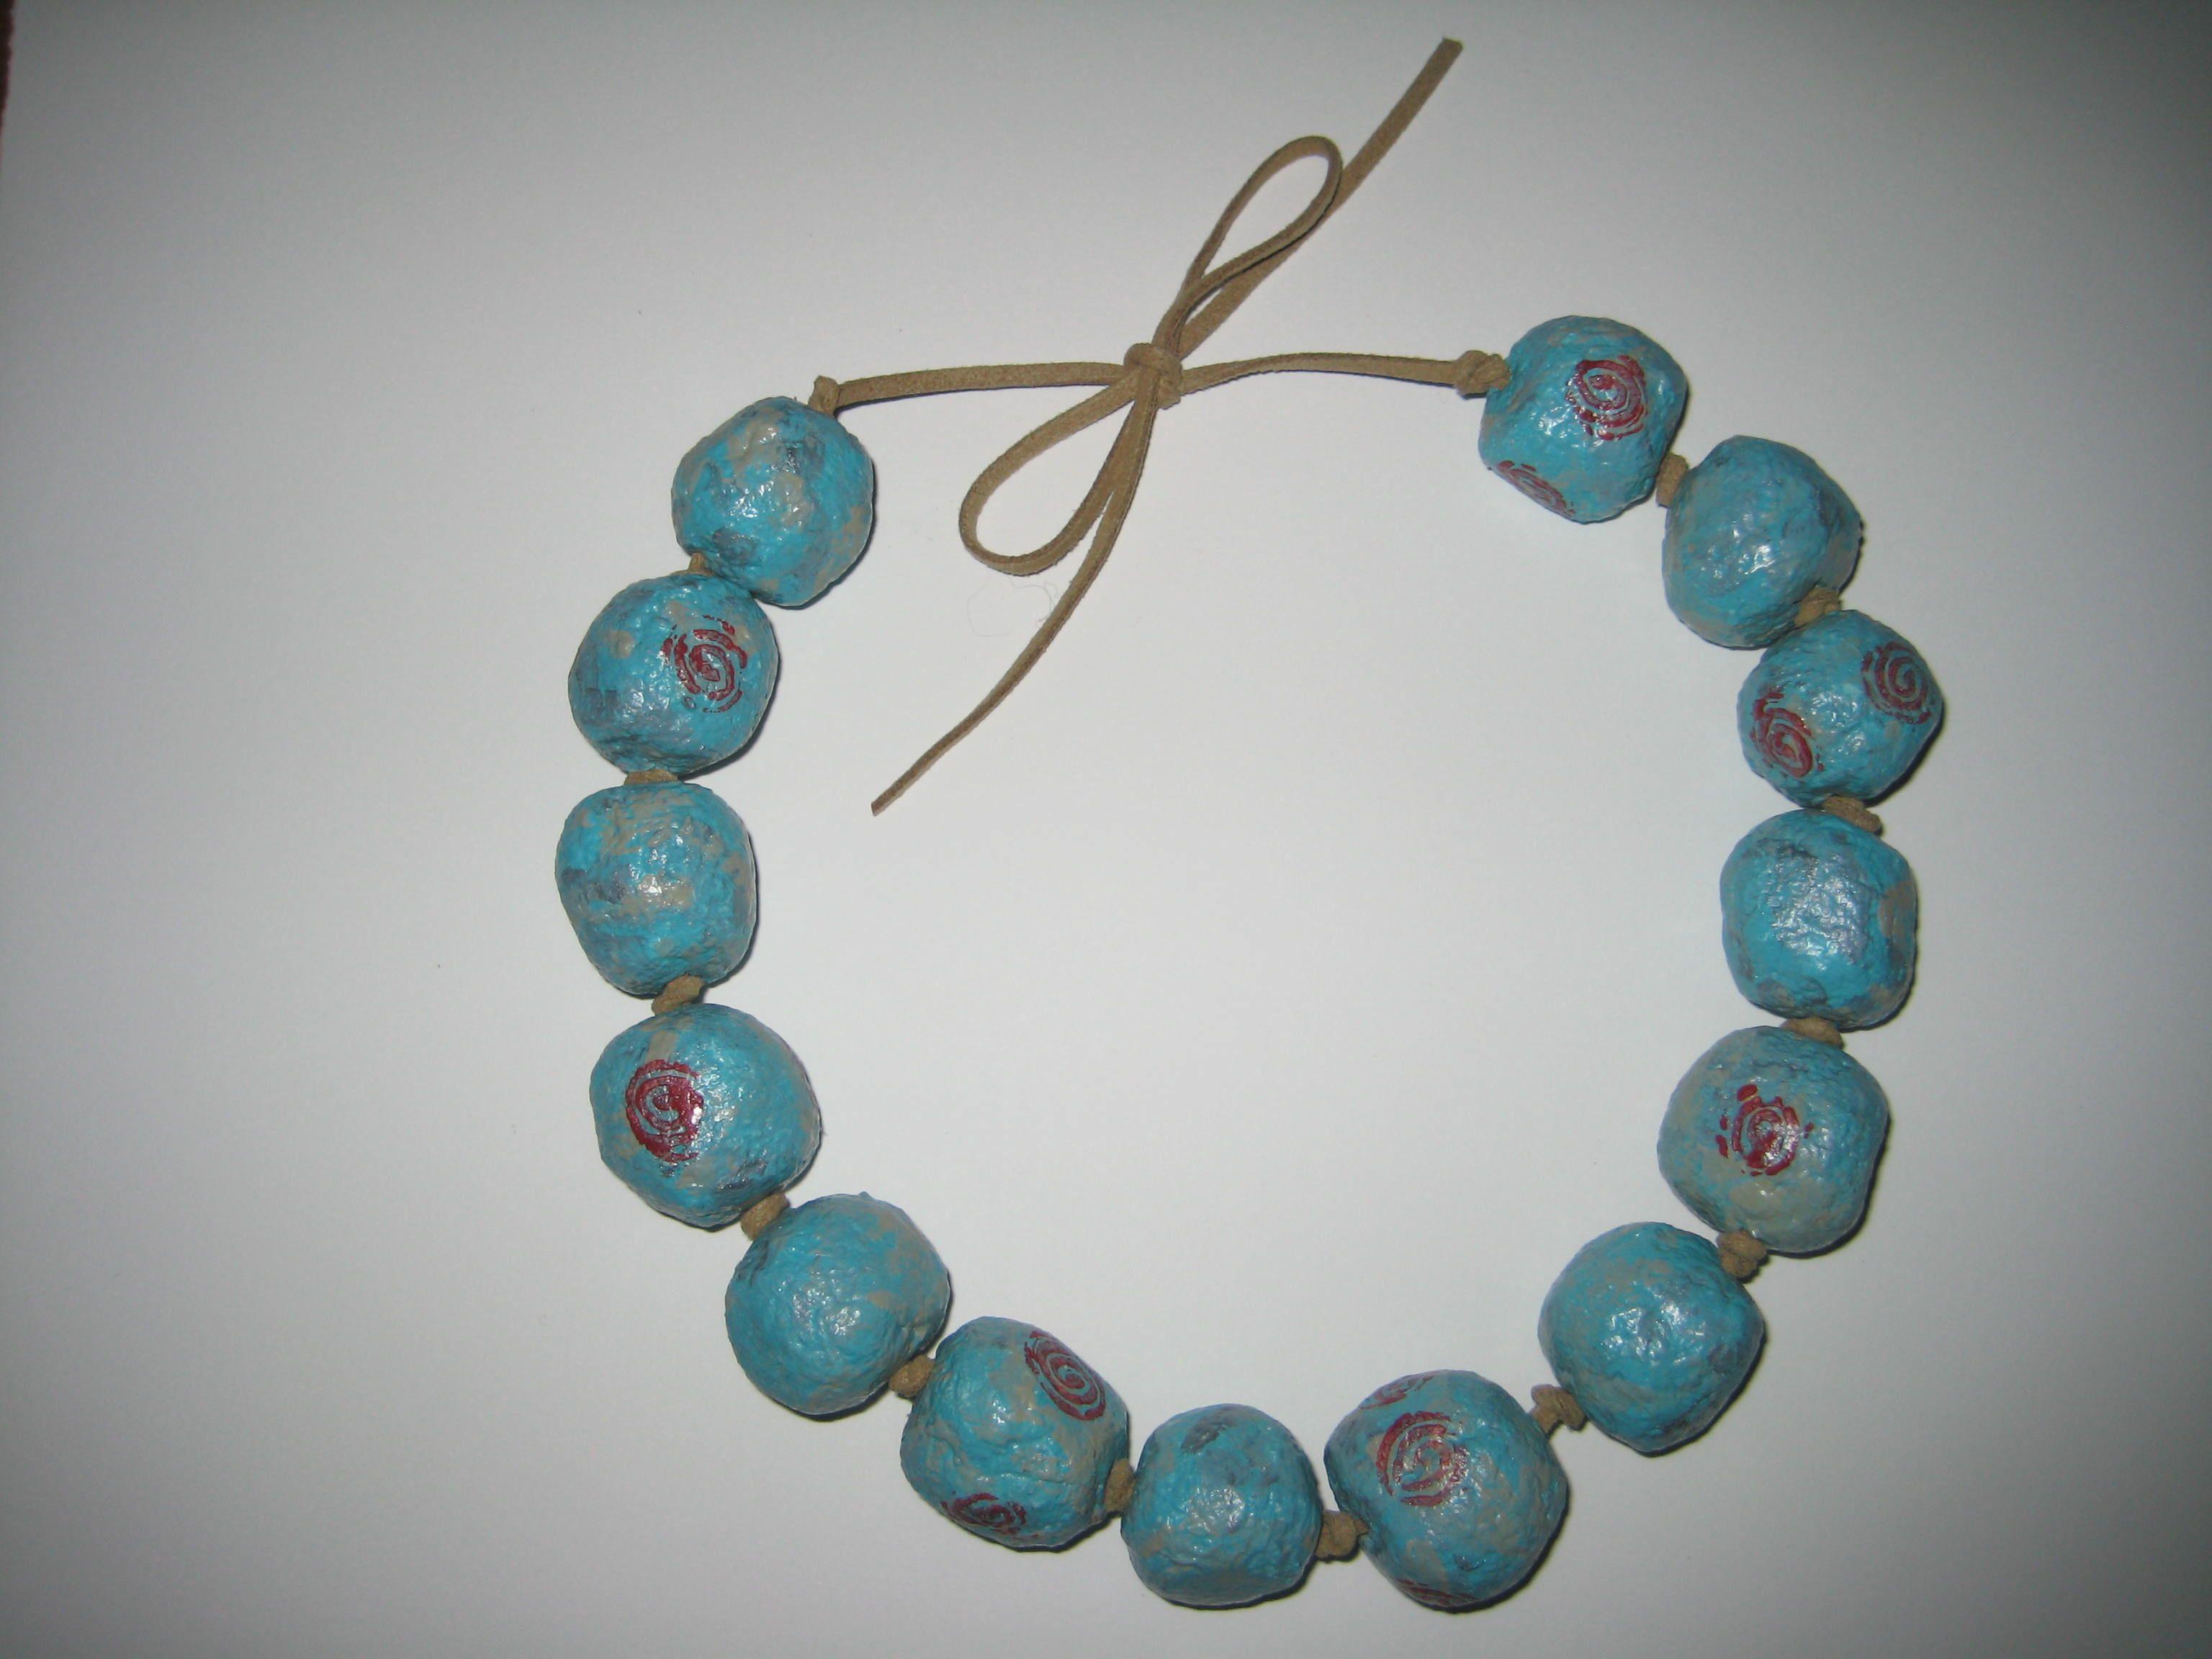 Paper Mache Bead Necklace Jewelry Crafts Handcrafted Jewelry Diy Jewelry